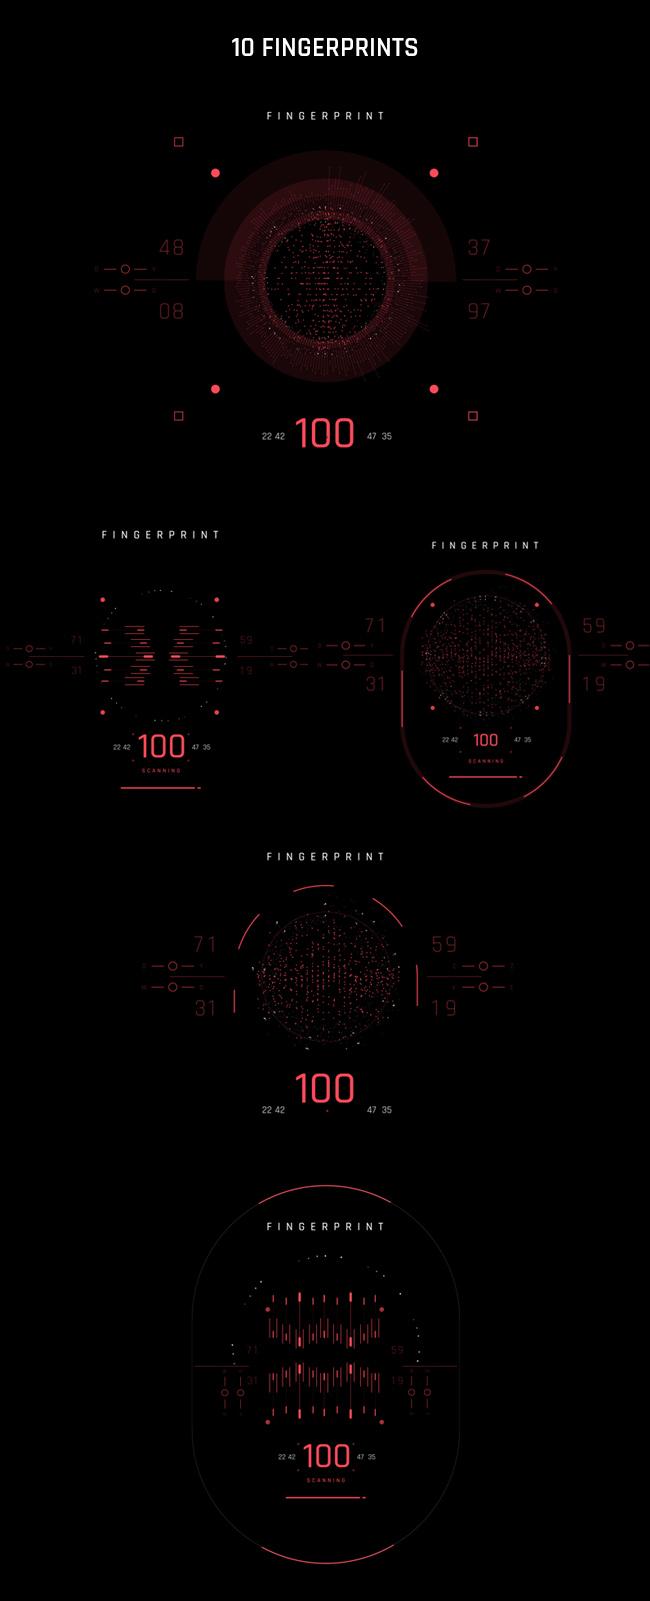 AE脚本-500个HUD高科技赛博朋克UI科幻界面元素动画预设包 Cyberpunk HUD UI 500+ 已修复中文版AE表达式报错插图43